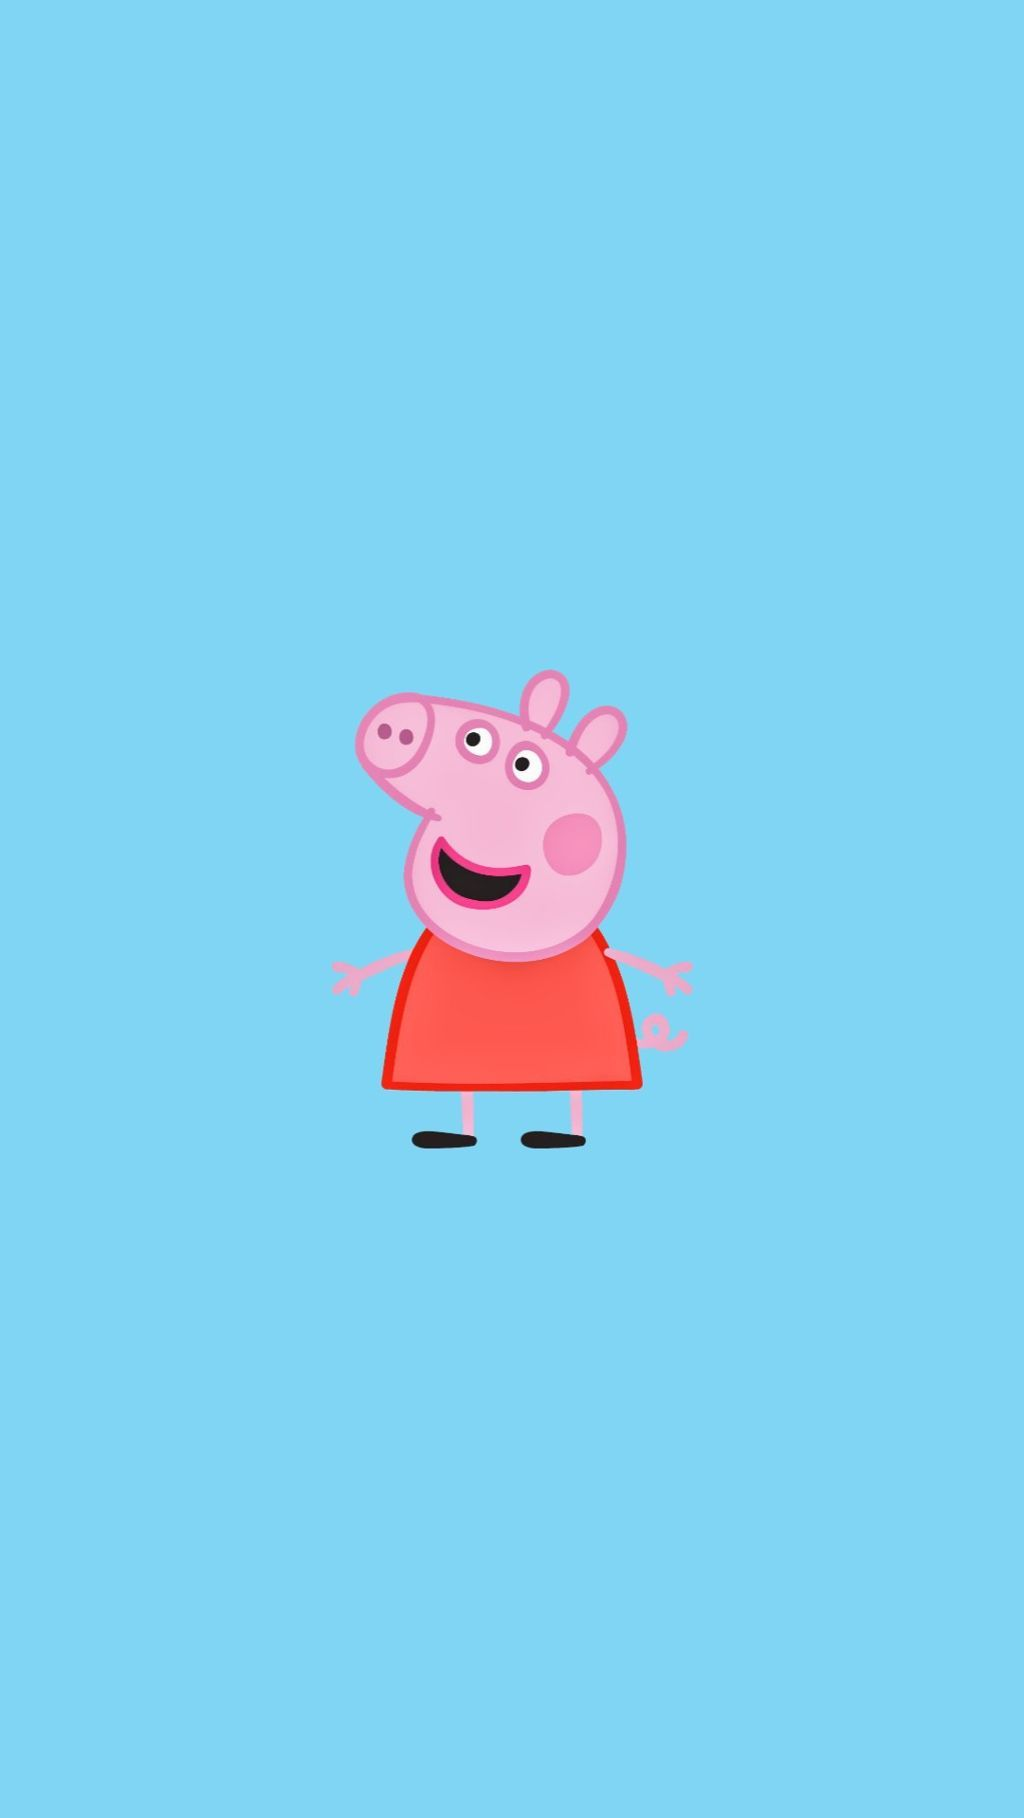 Peppa Pig Ipad Wallpapers Top Free Peppa Pig Ipad Backgrounds